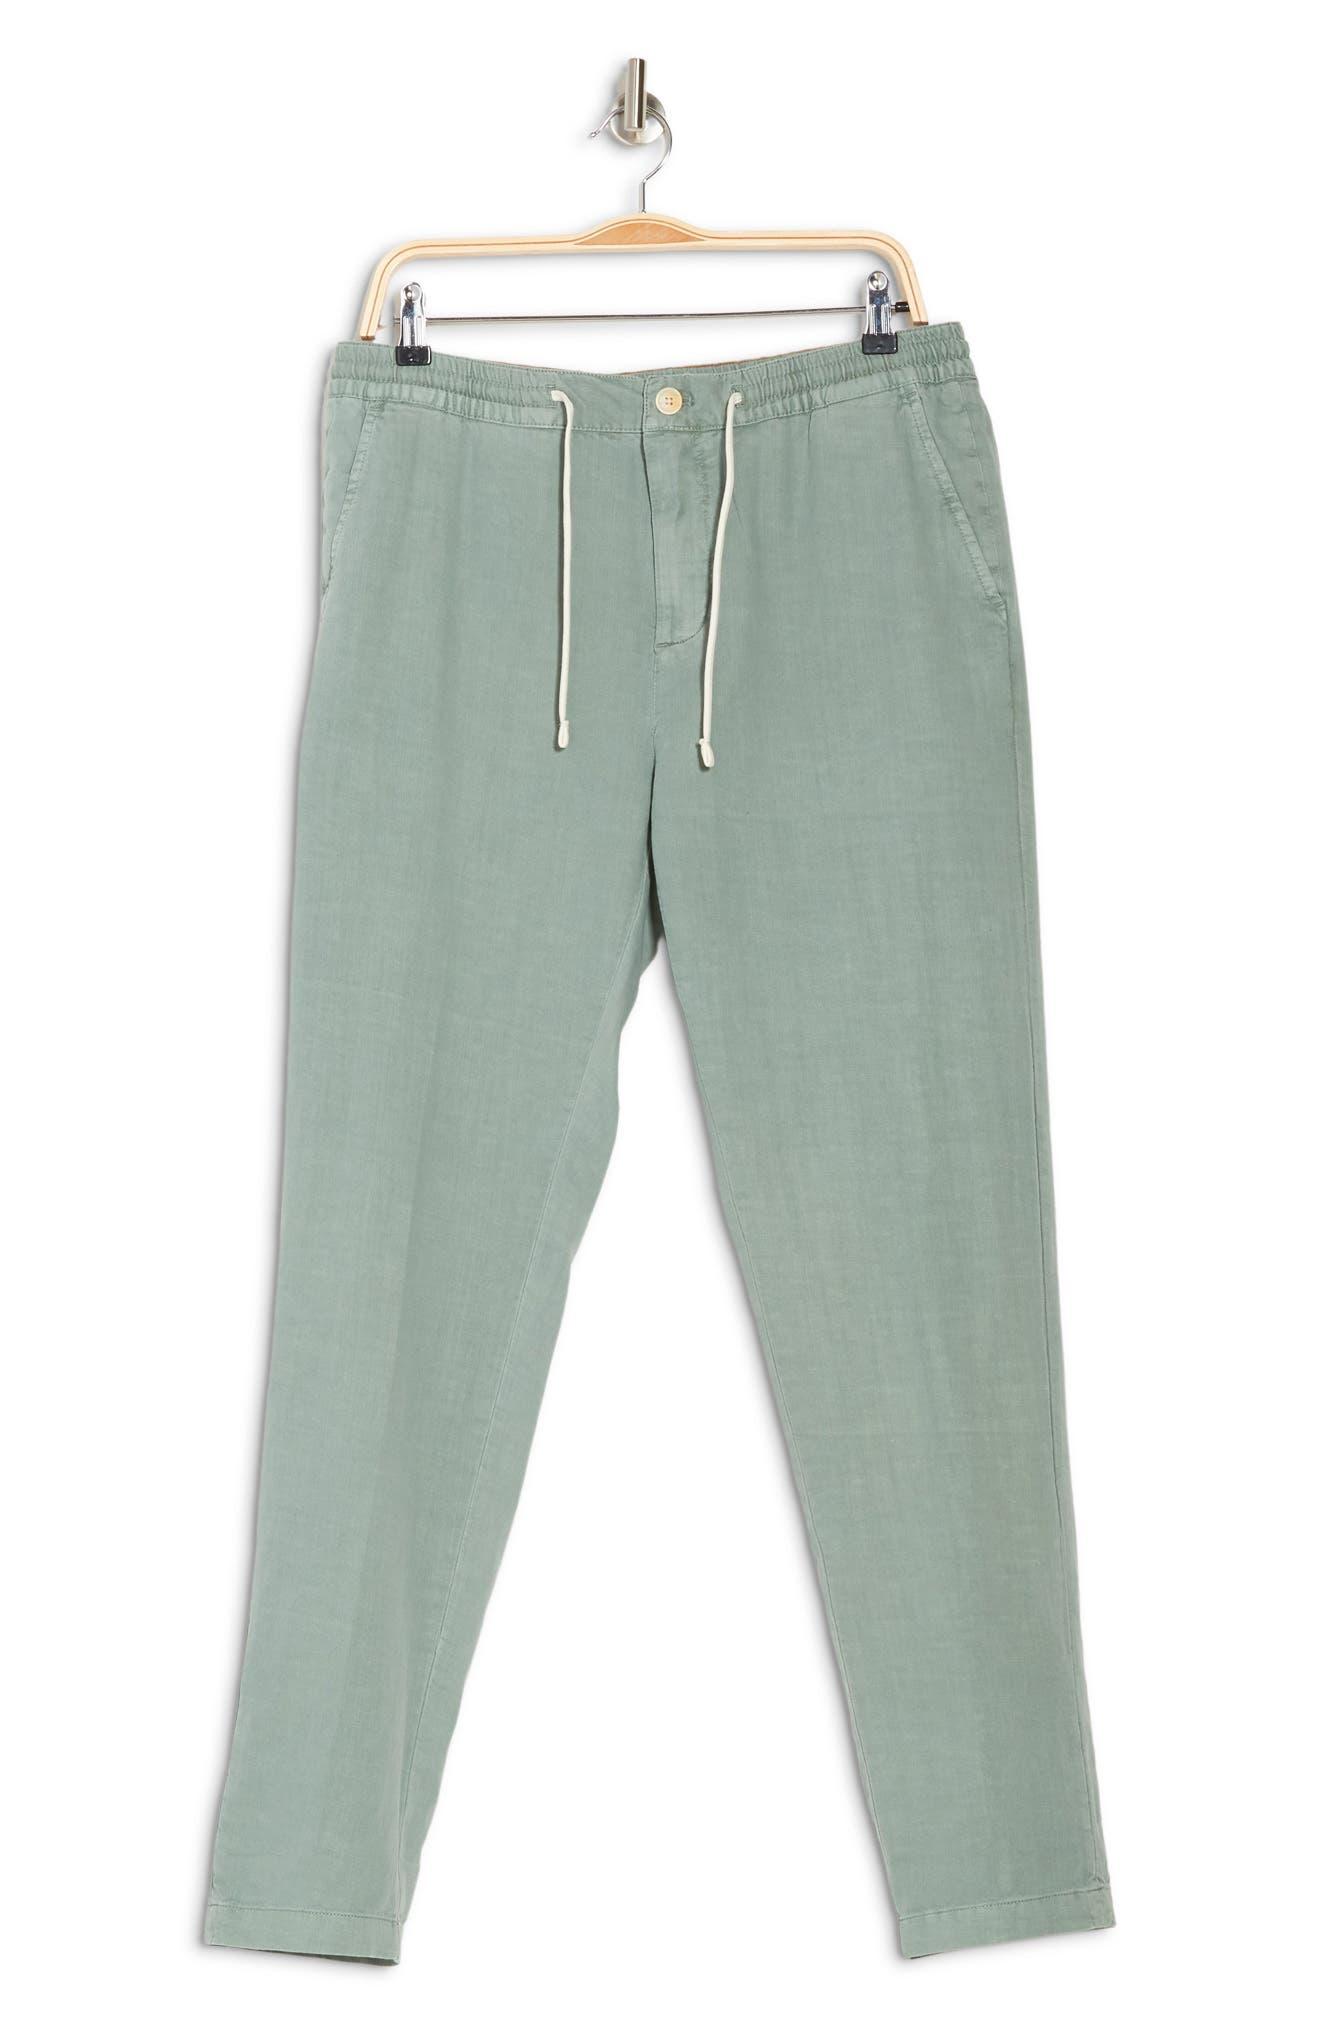 Scotch & Soda Warren Stripe Pants In 0238-emerald